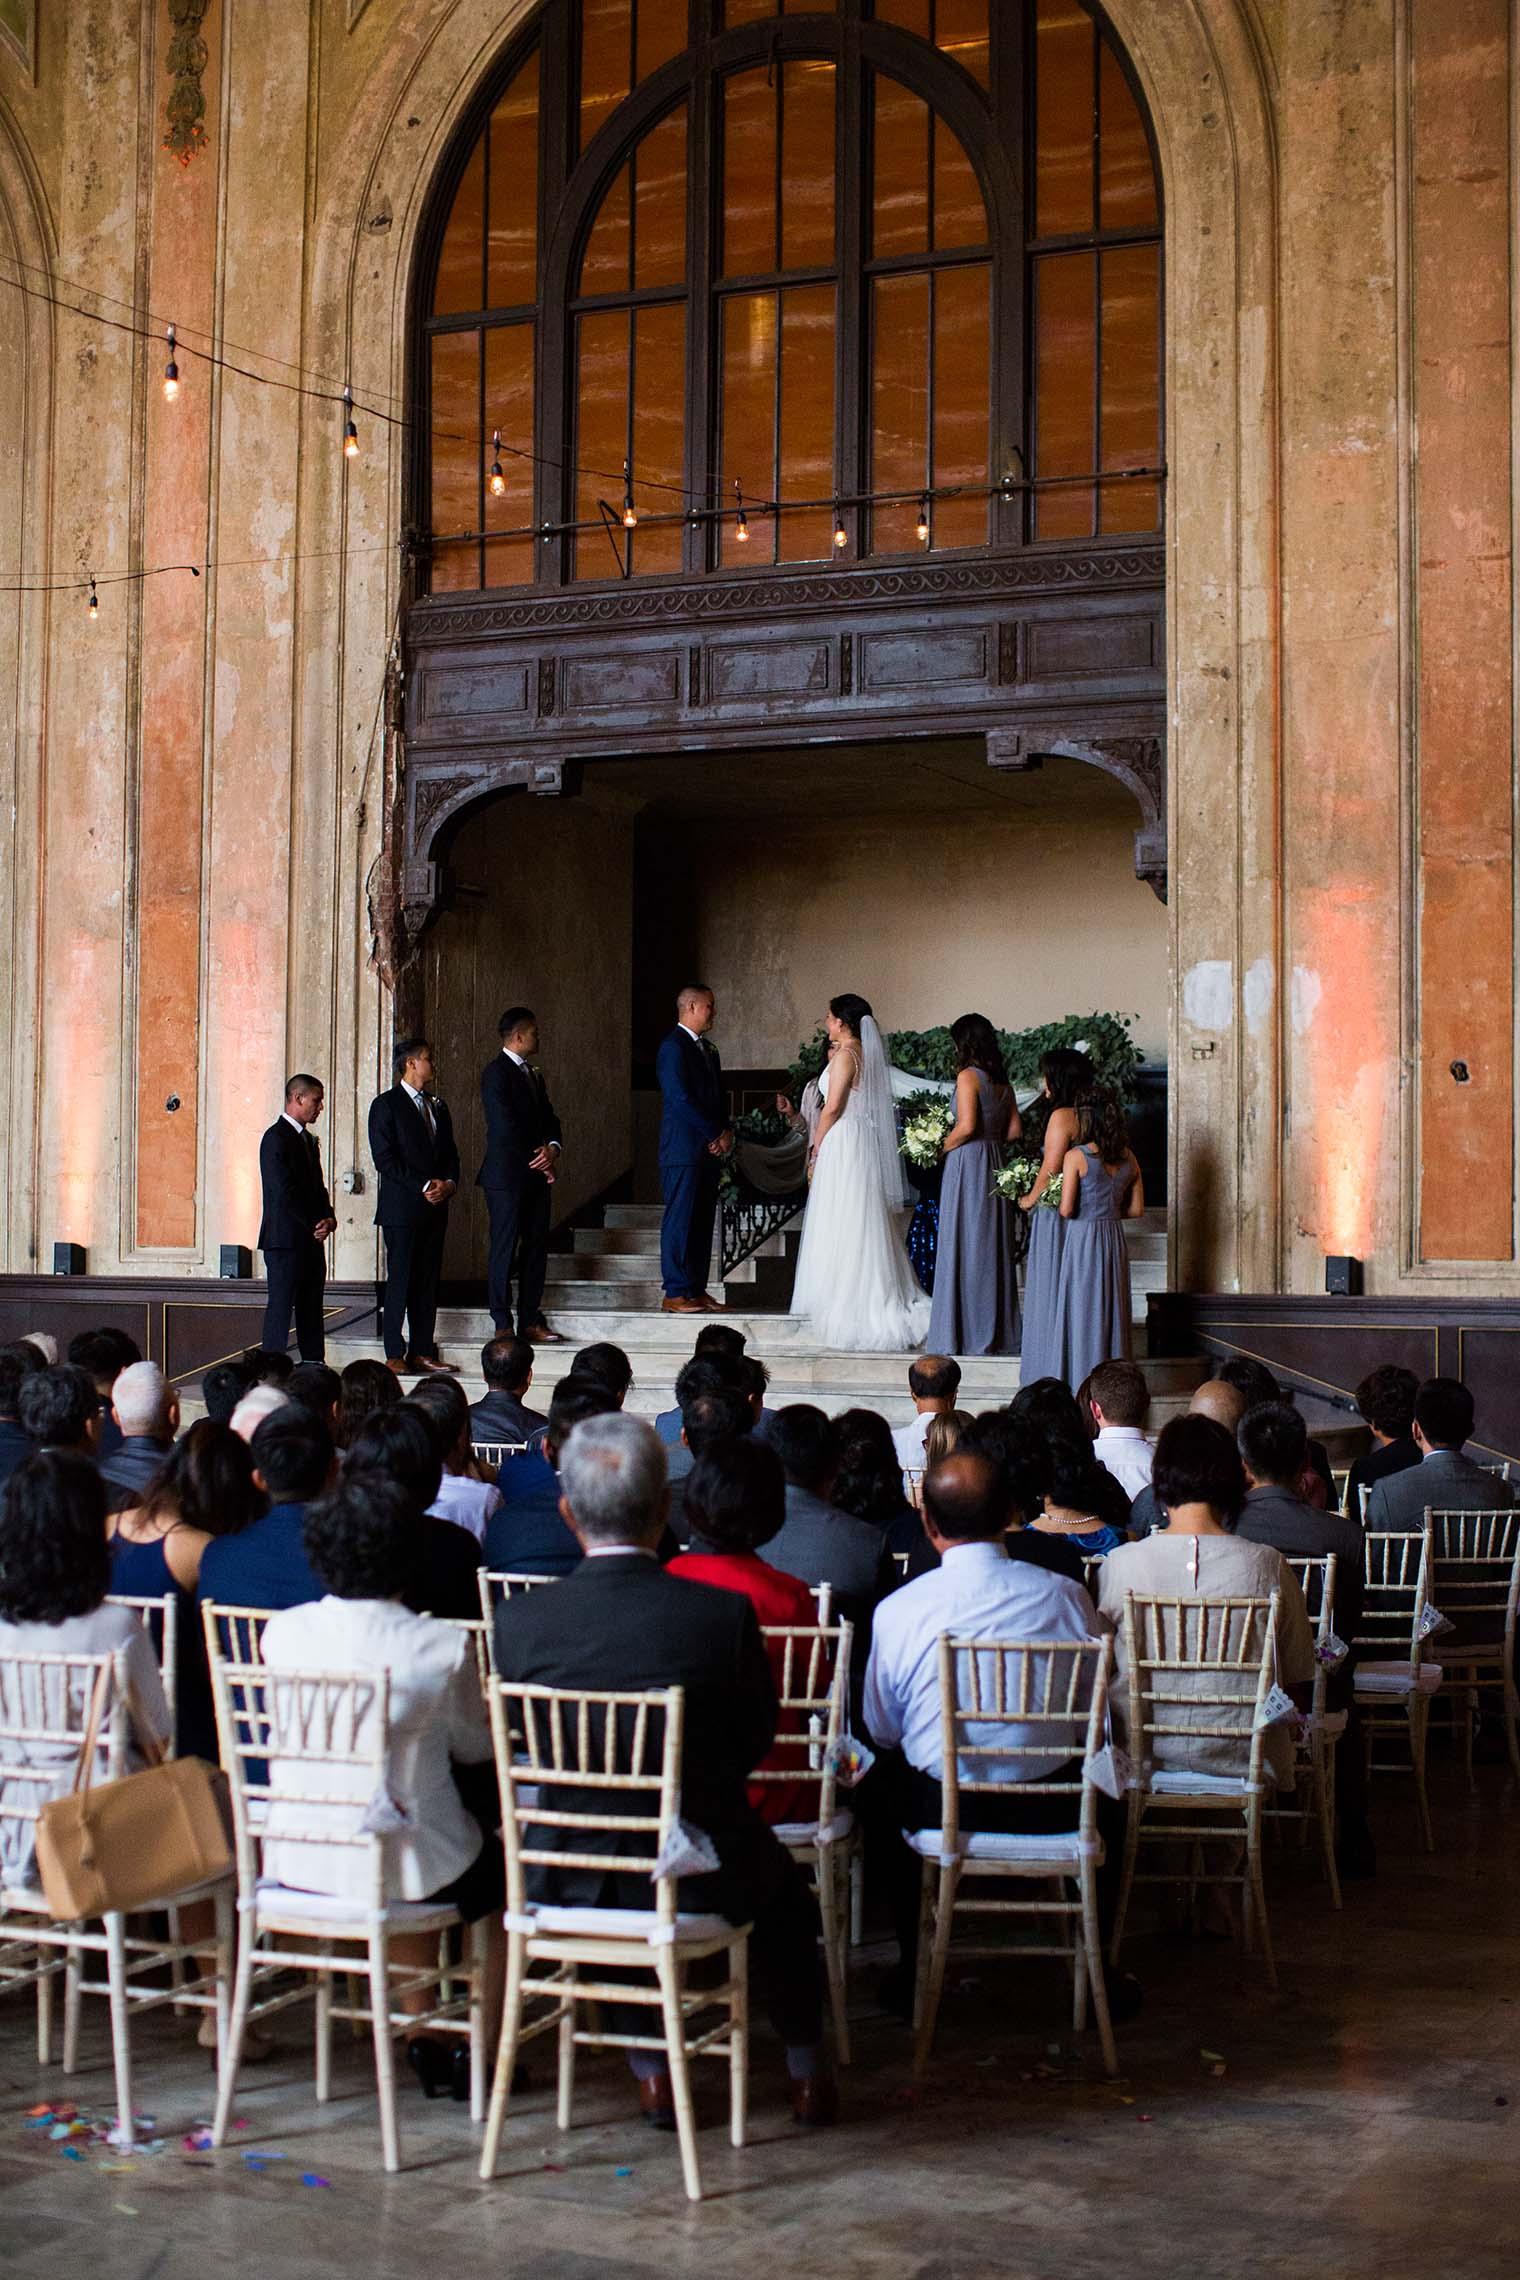 16th Street Station Wedding Ceremony